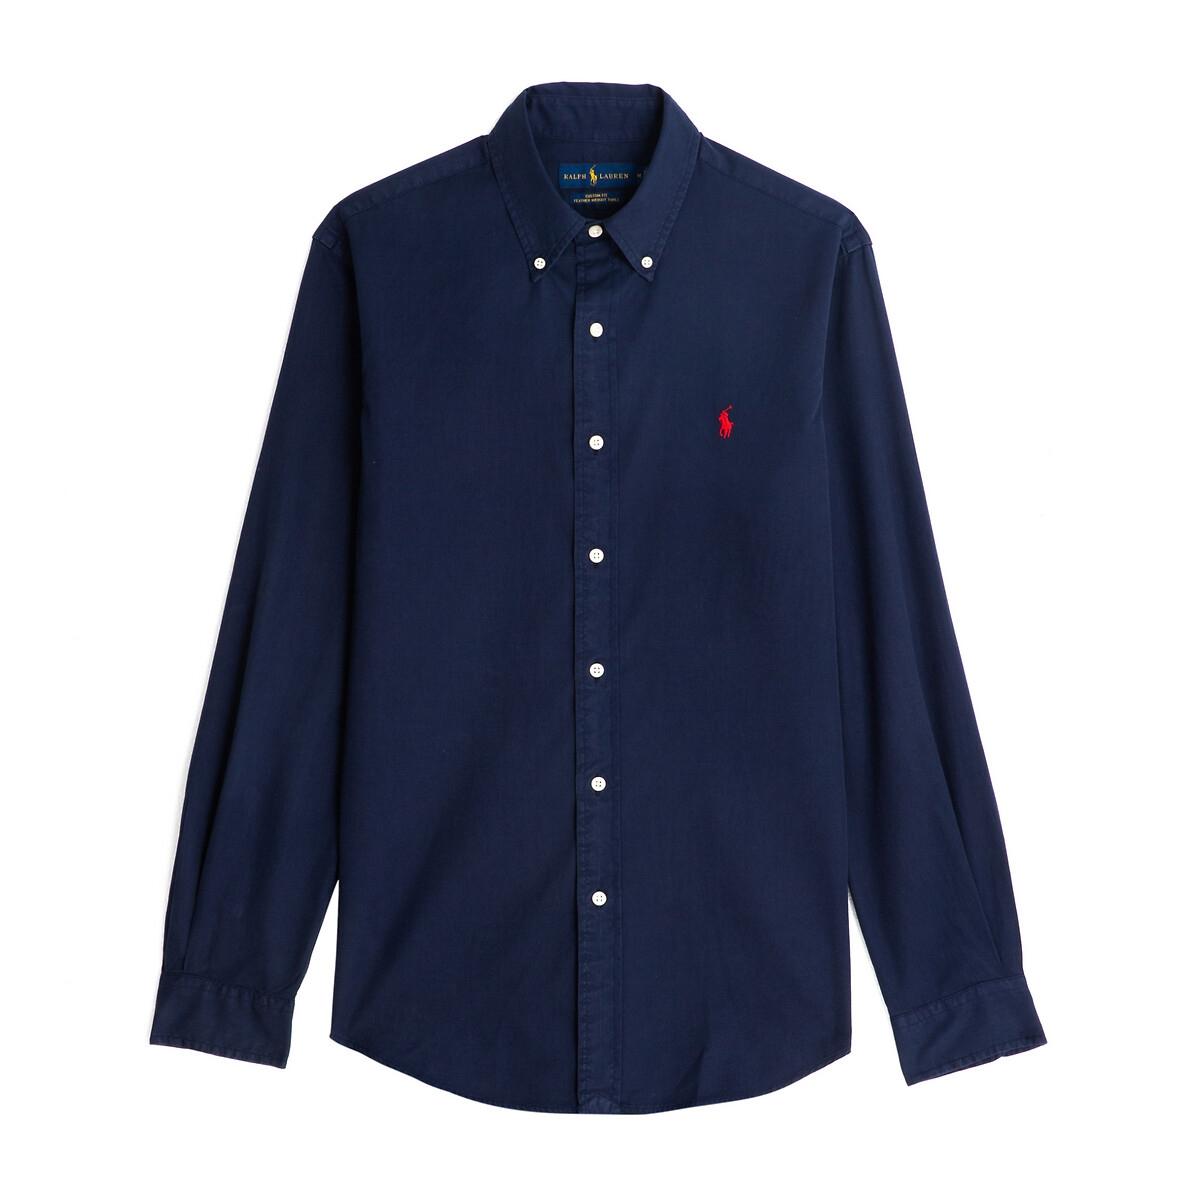 Рубашка LaRedoute Прямого покроя из поплина стретч M синий